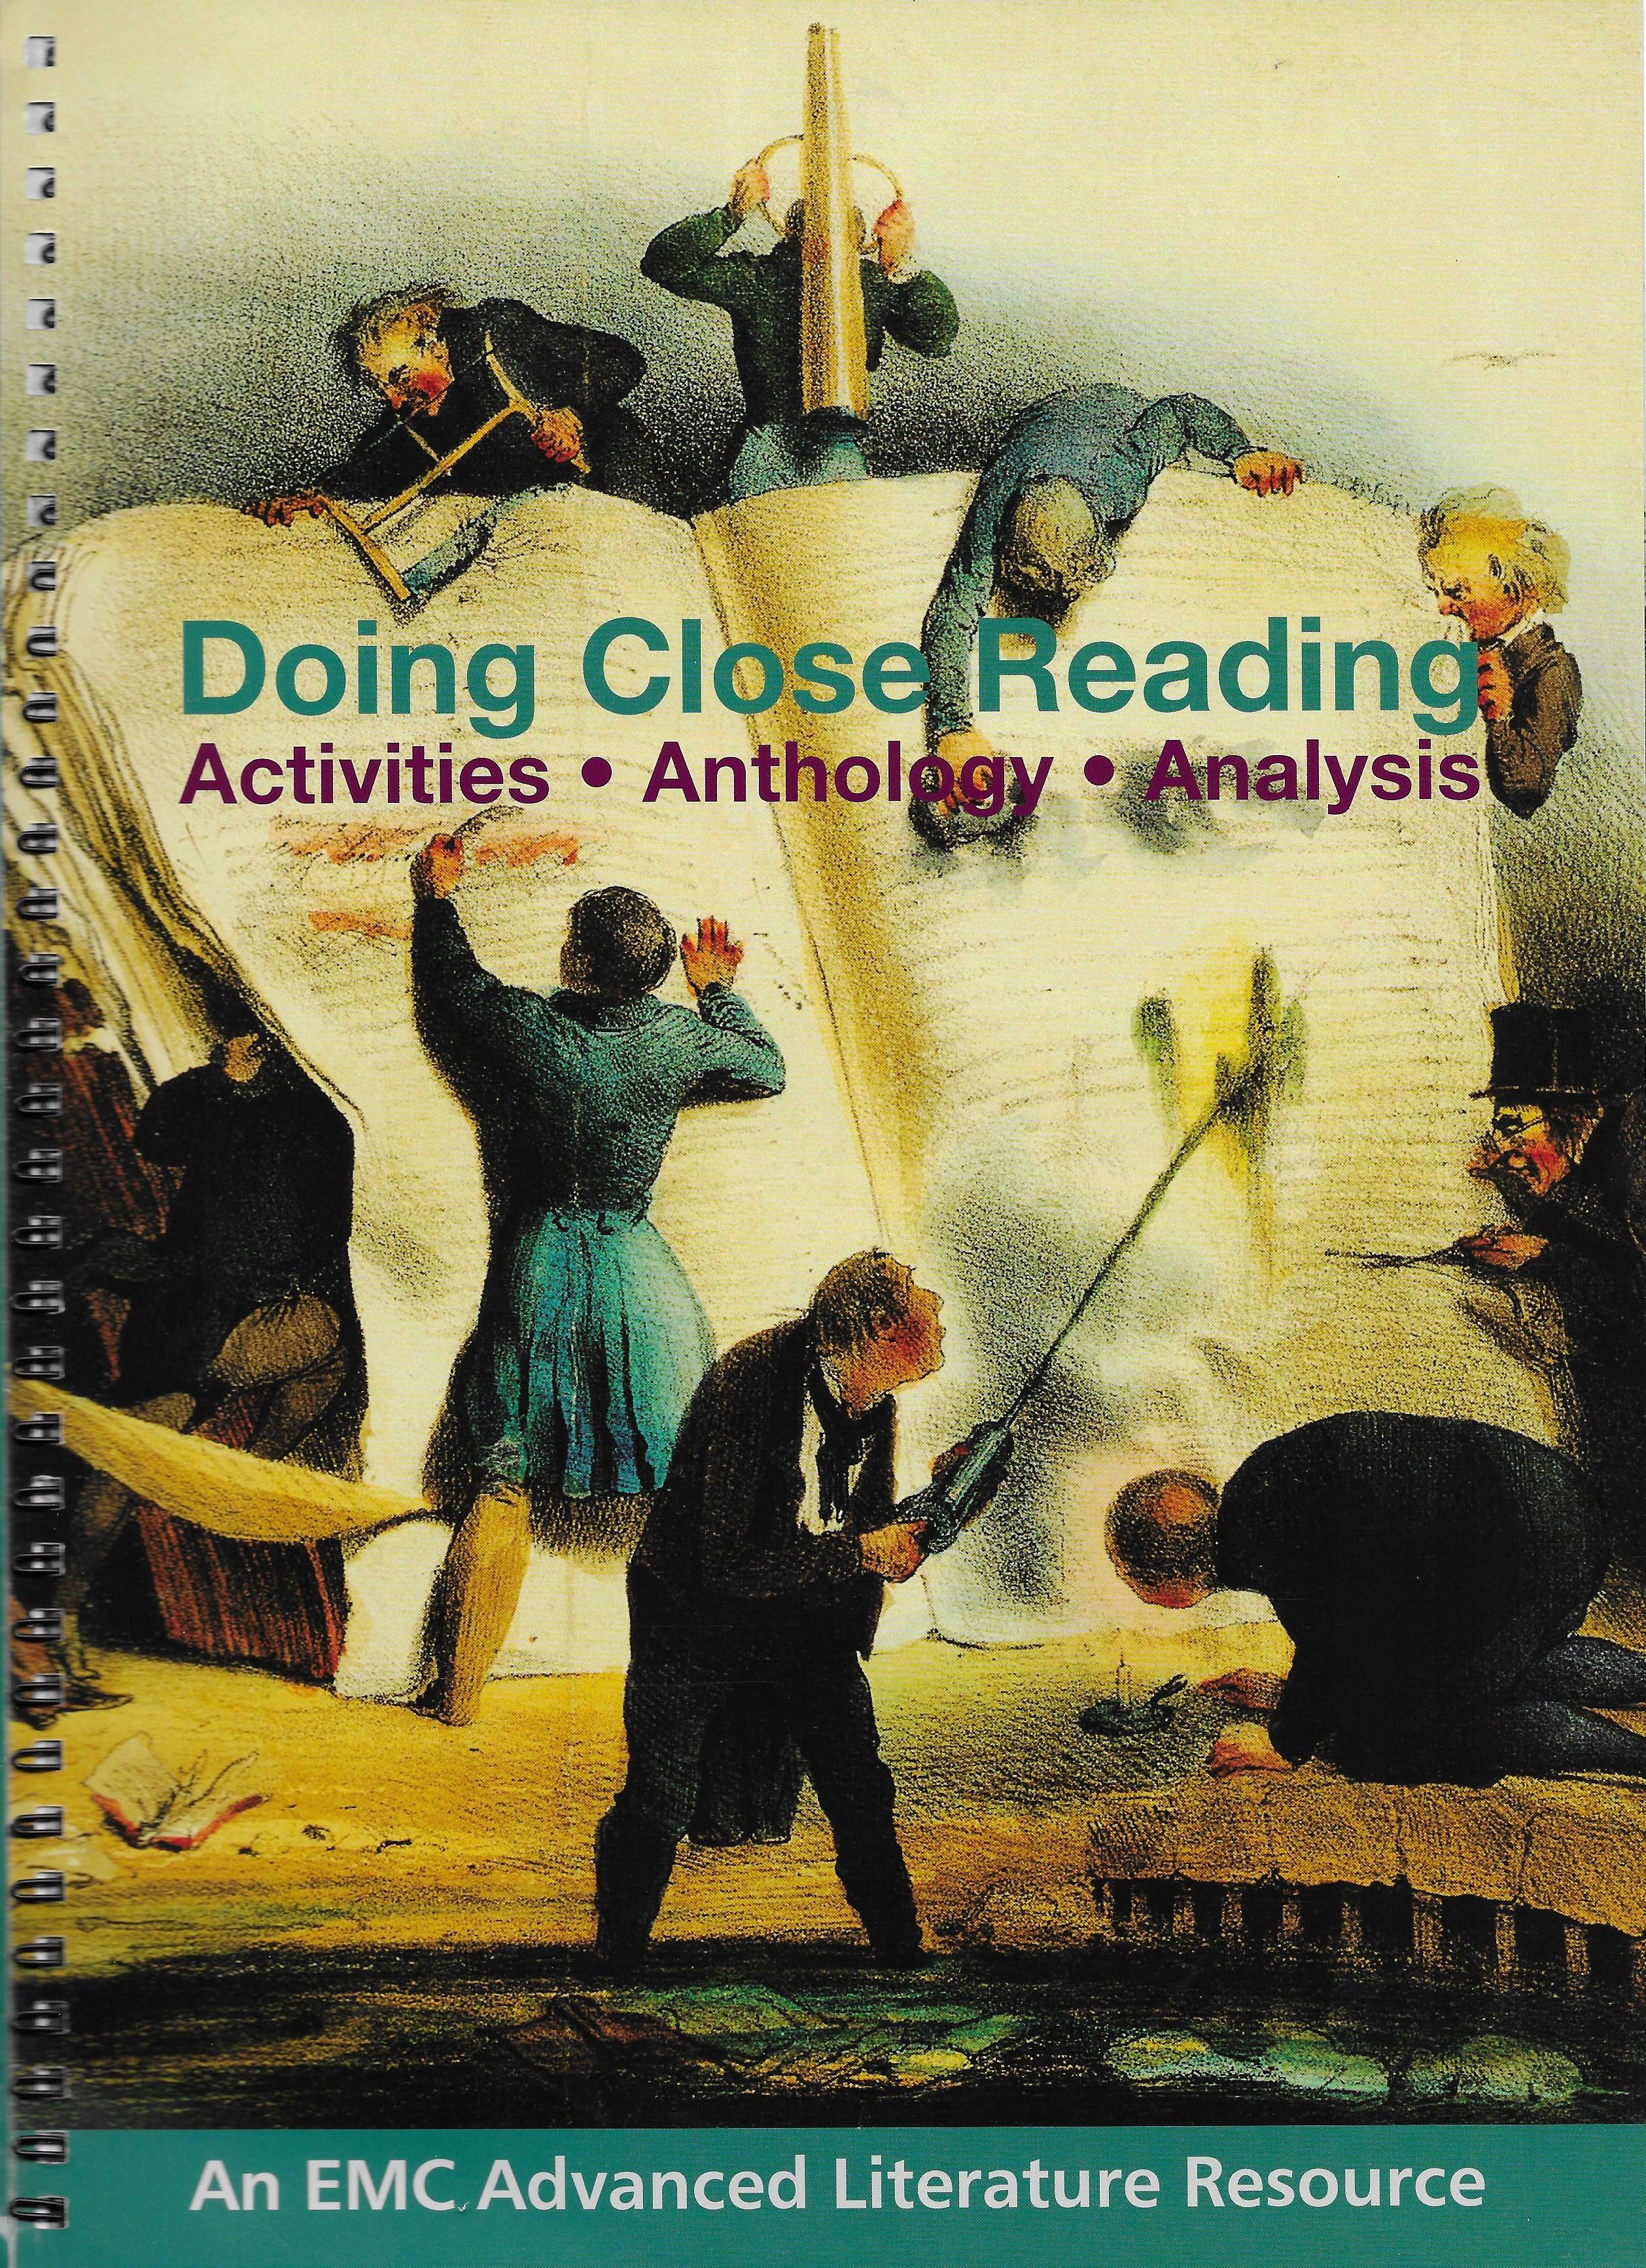 https://0201.nccdn.net/4_2/000/000/053/0e8/emc-doing-close-reading-cover-5-oct-21.jpg